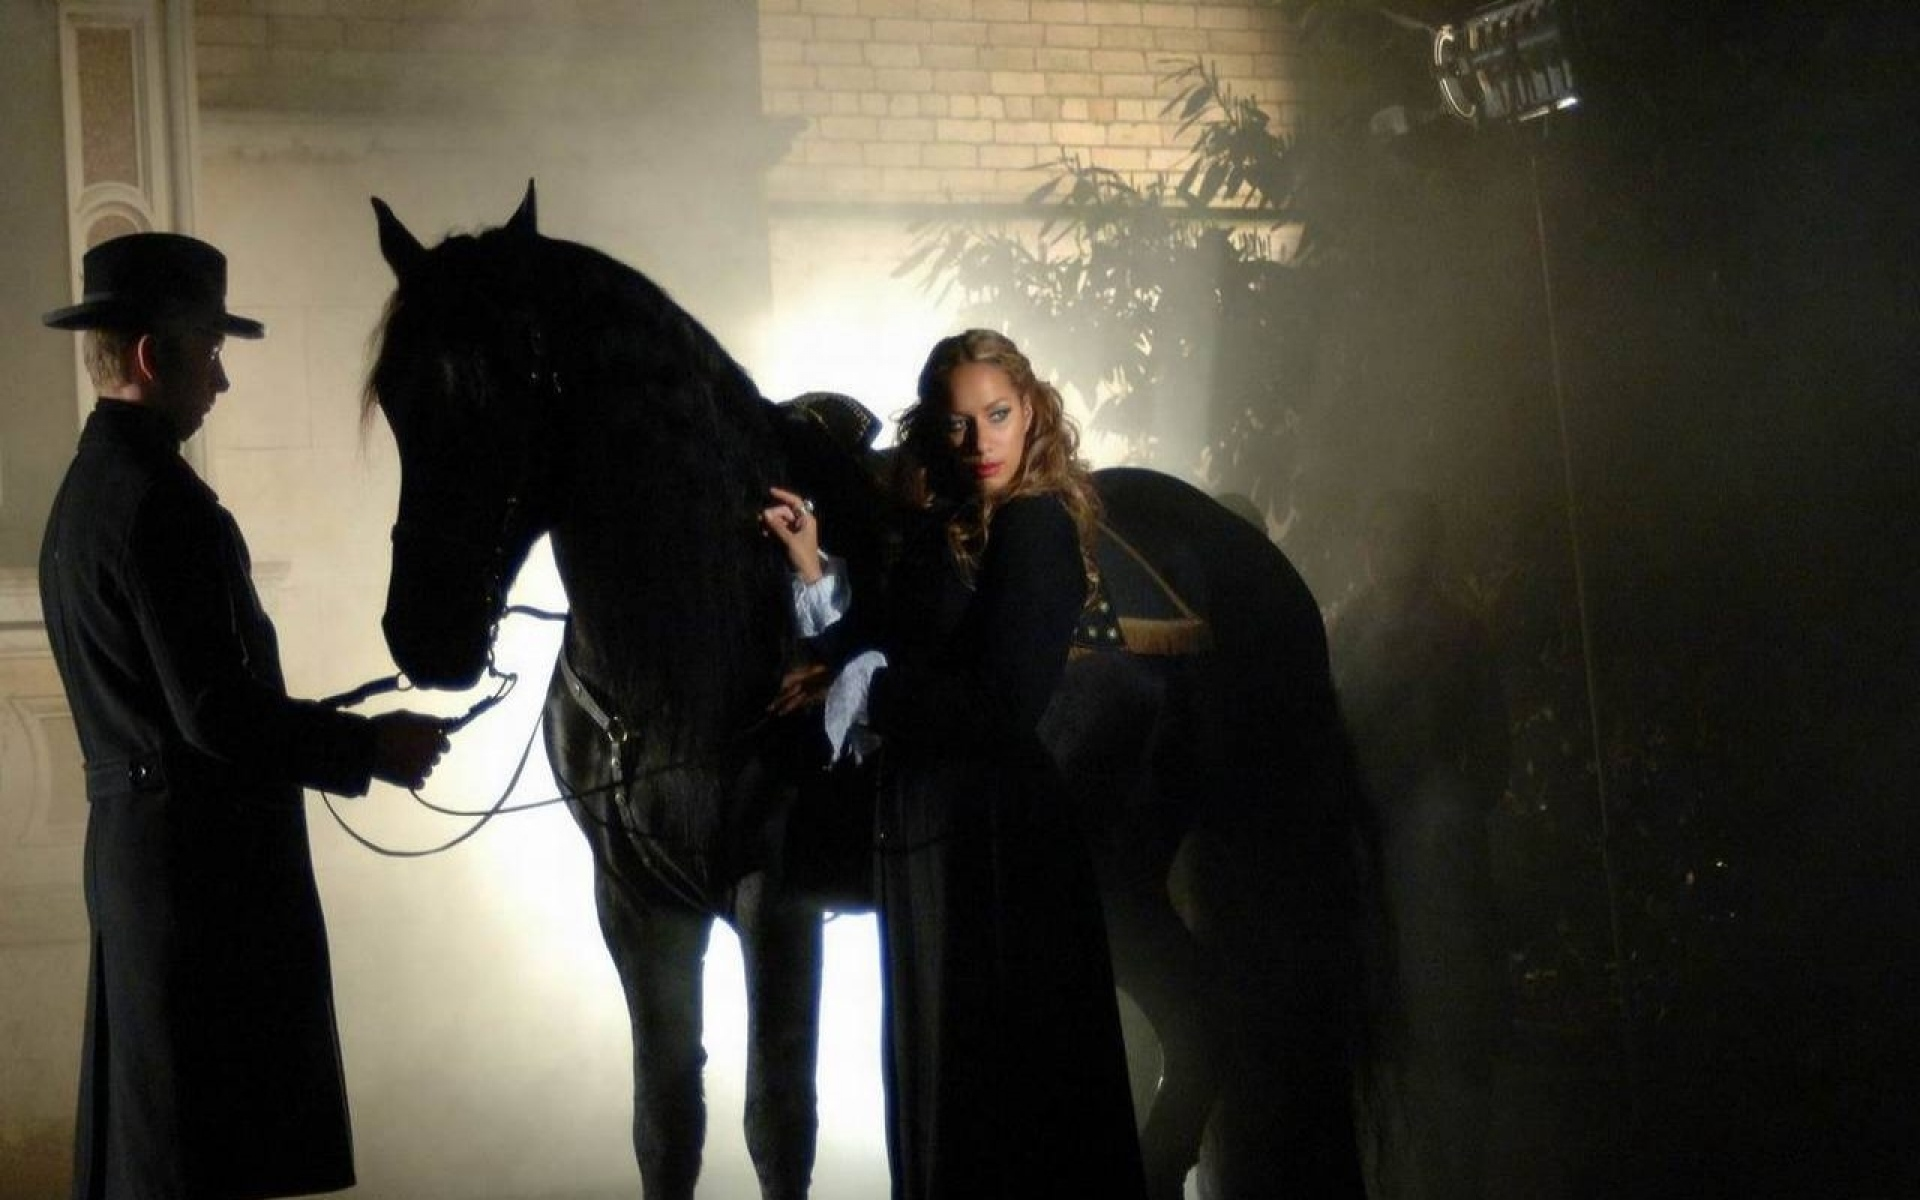 Картинки Leona lewis, девушка, лошадь, дым, жених фото и обои на рабочий стол